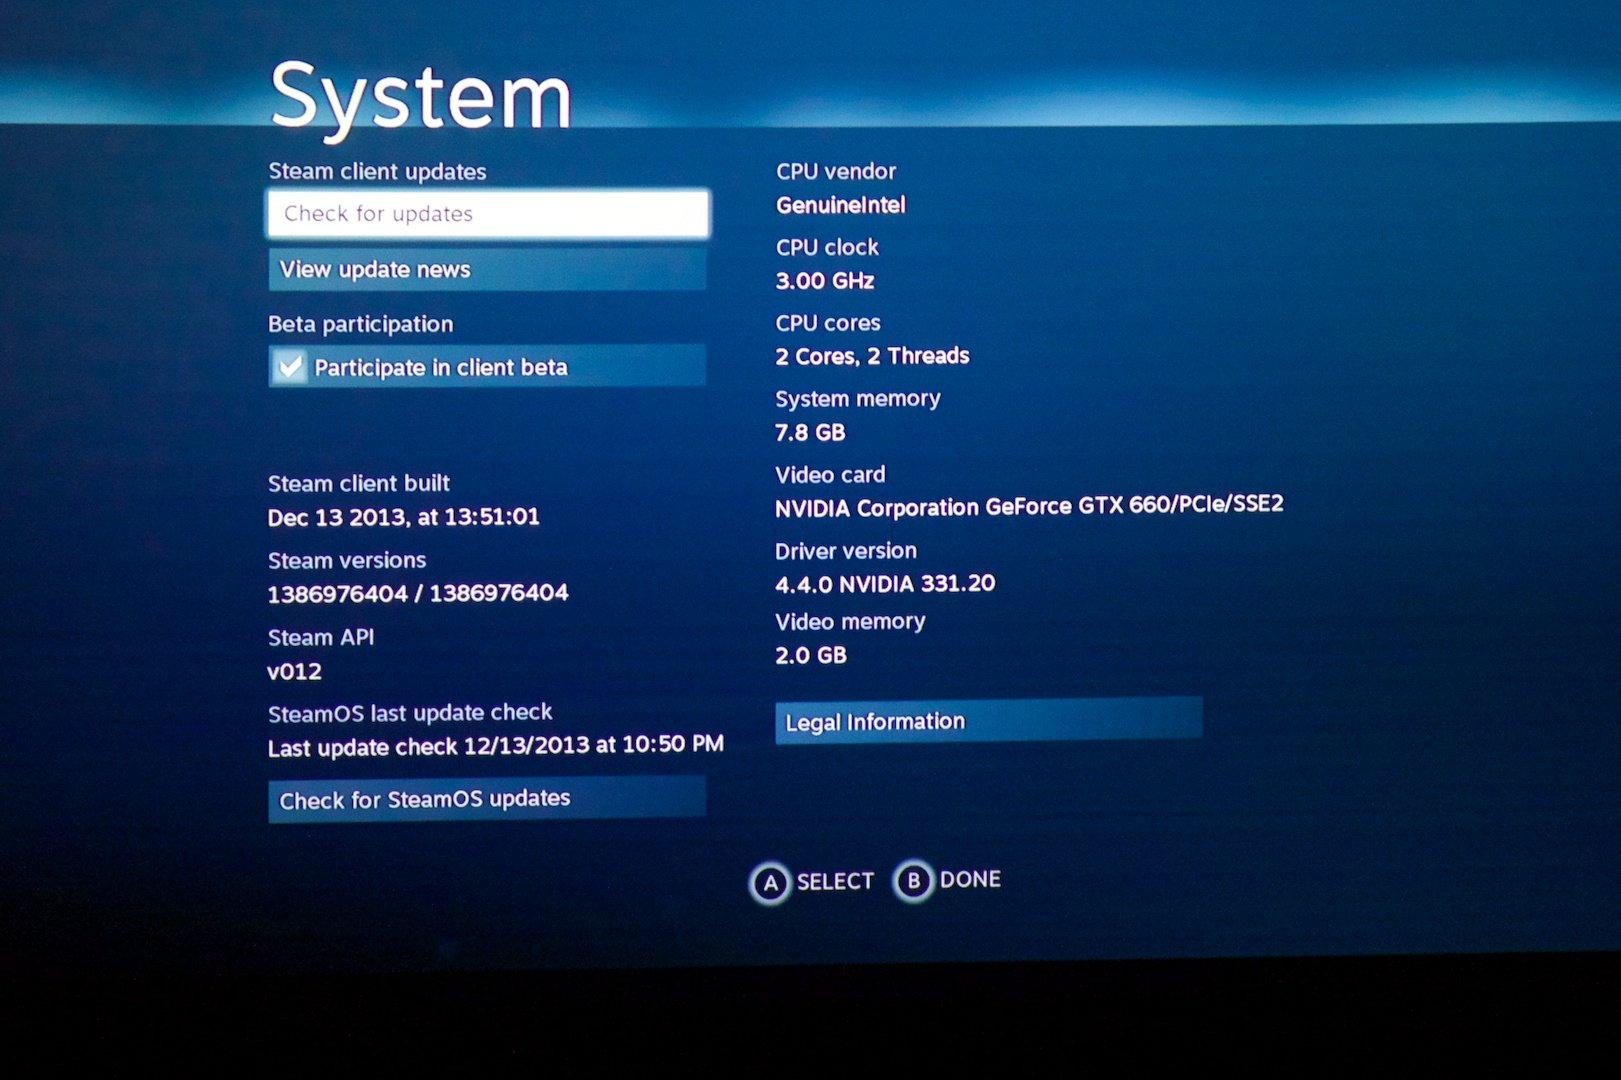 SteamOS System